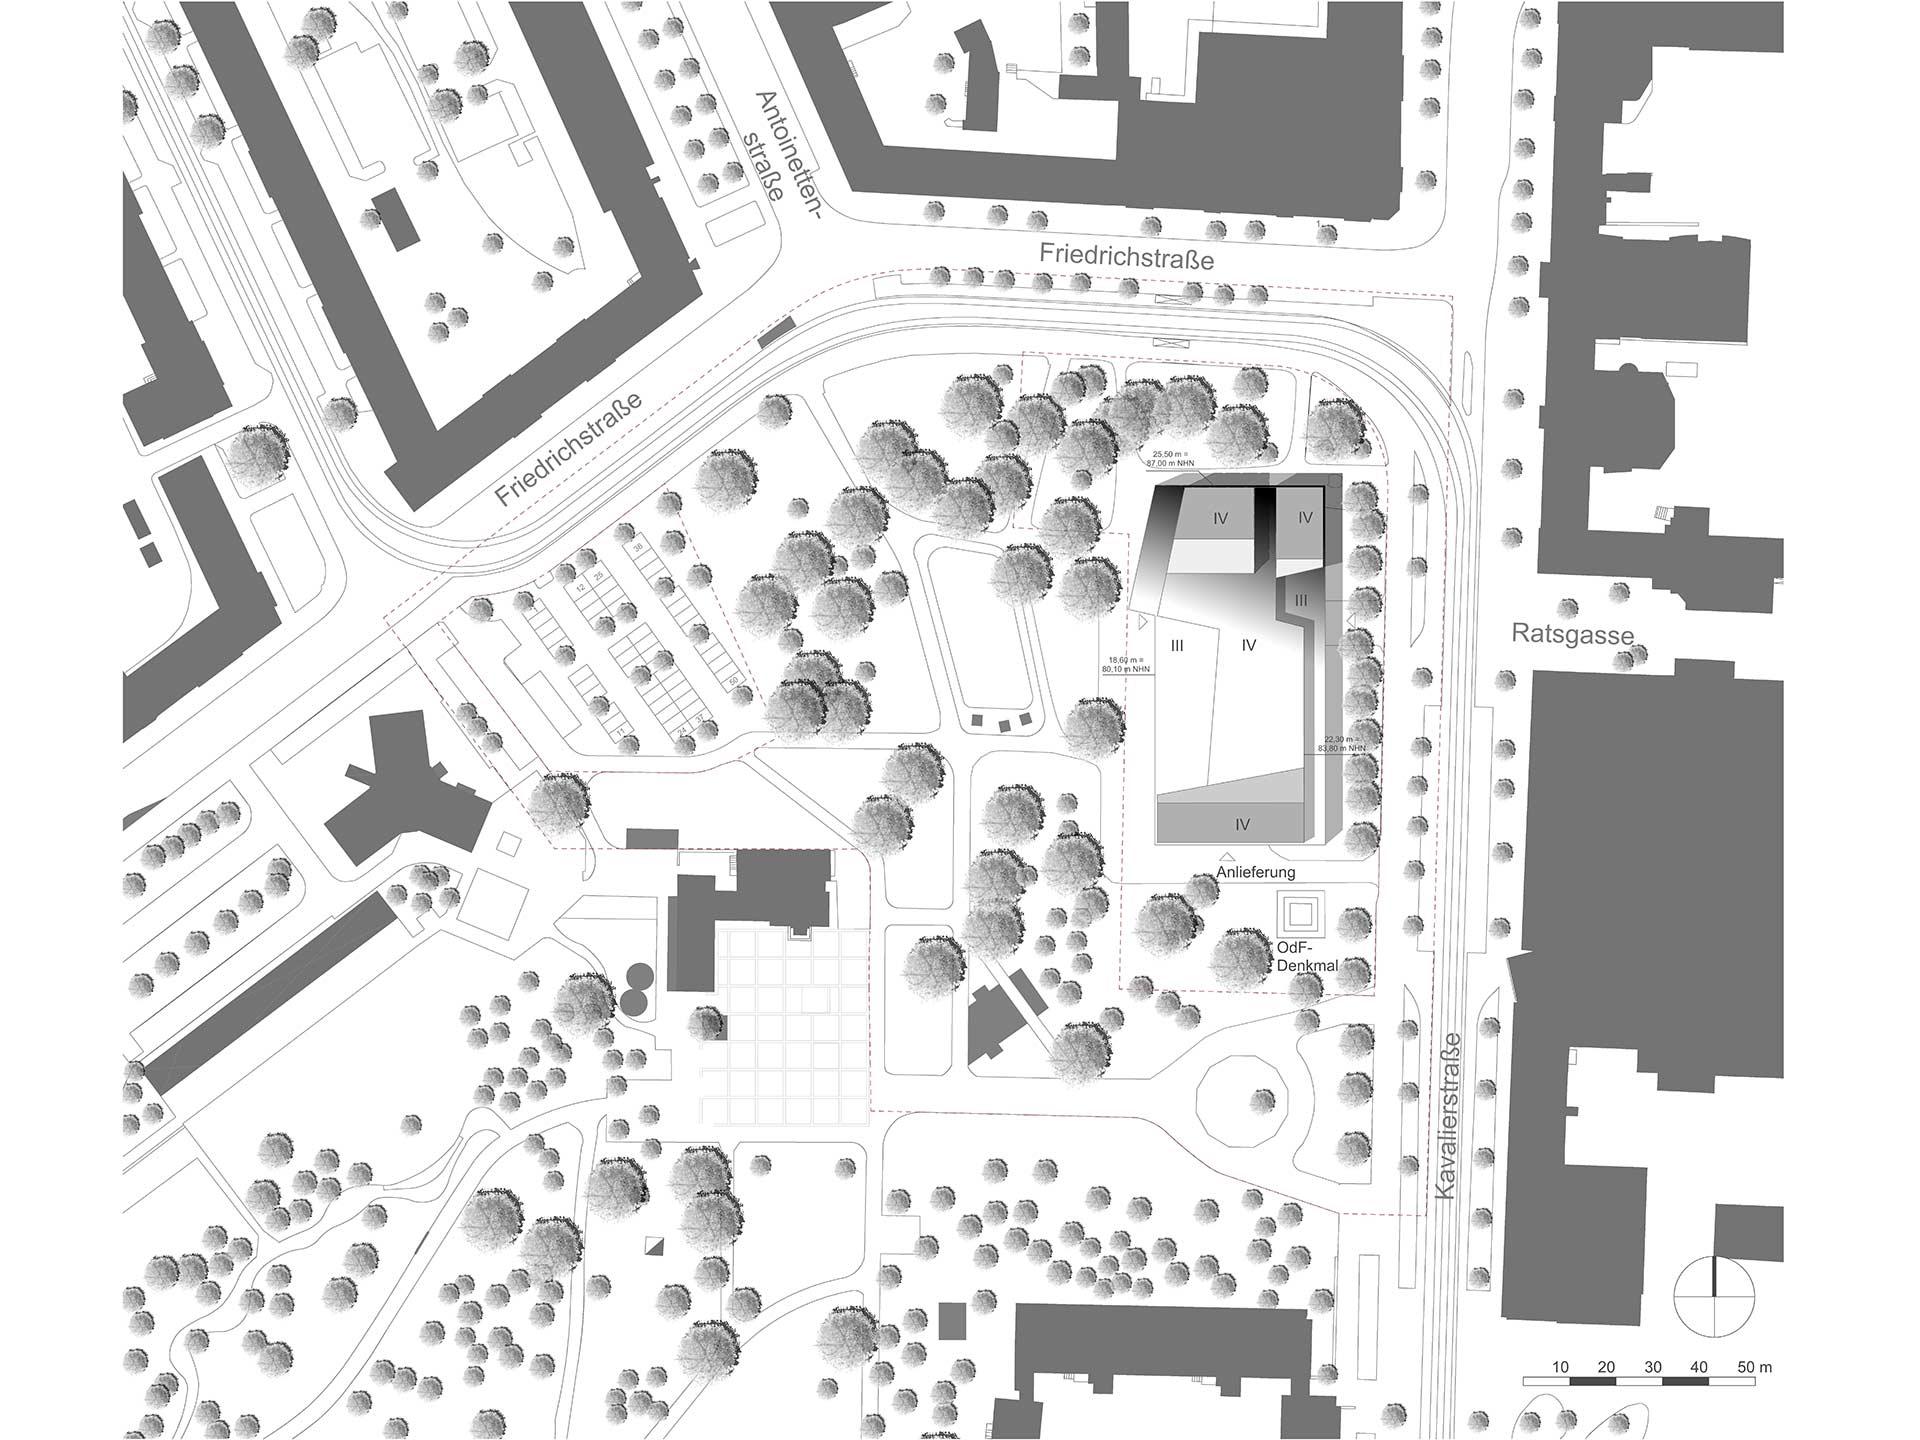 Bauhaus Museum Dessau Skizze